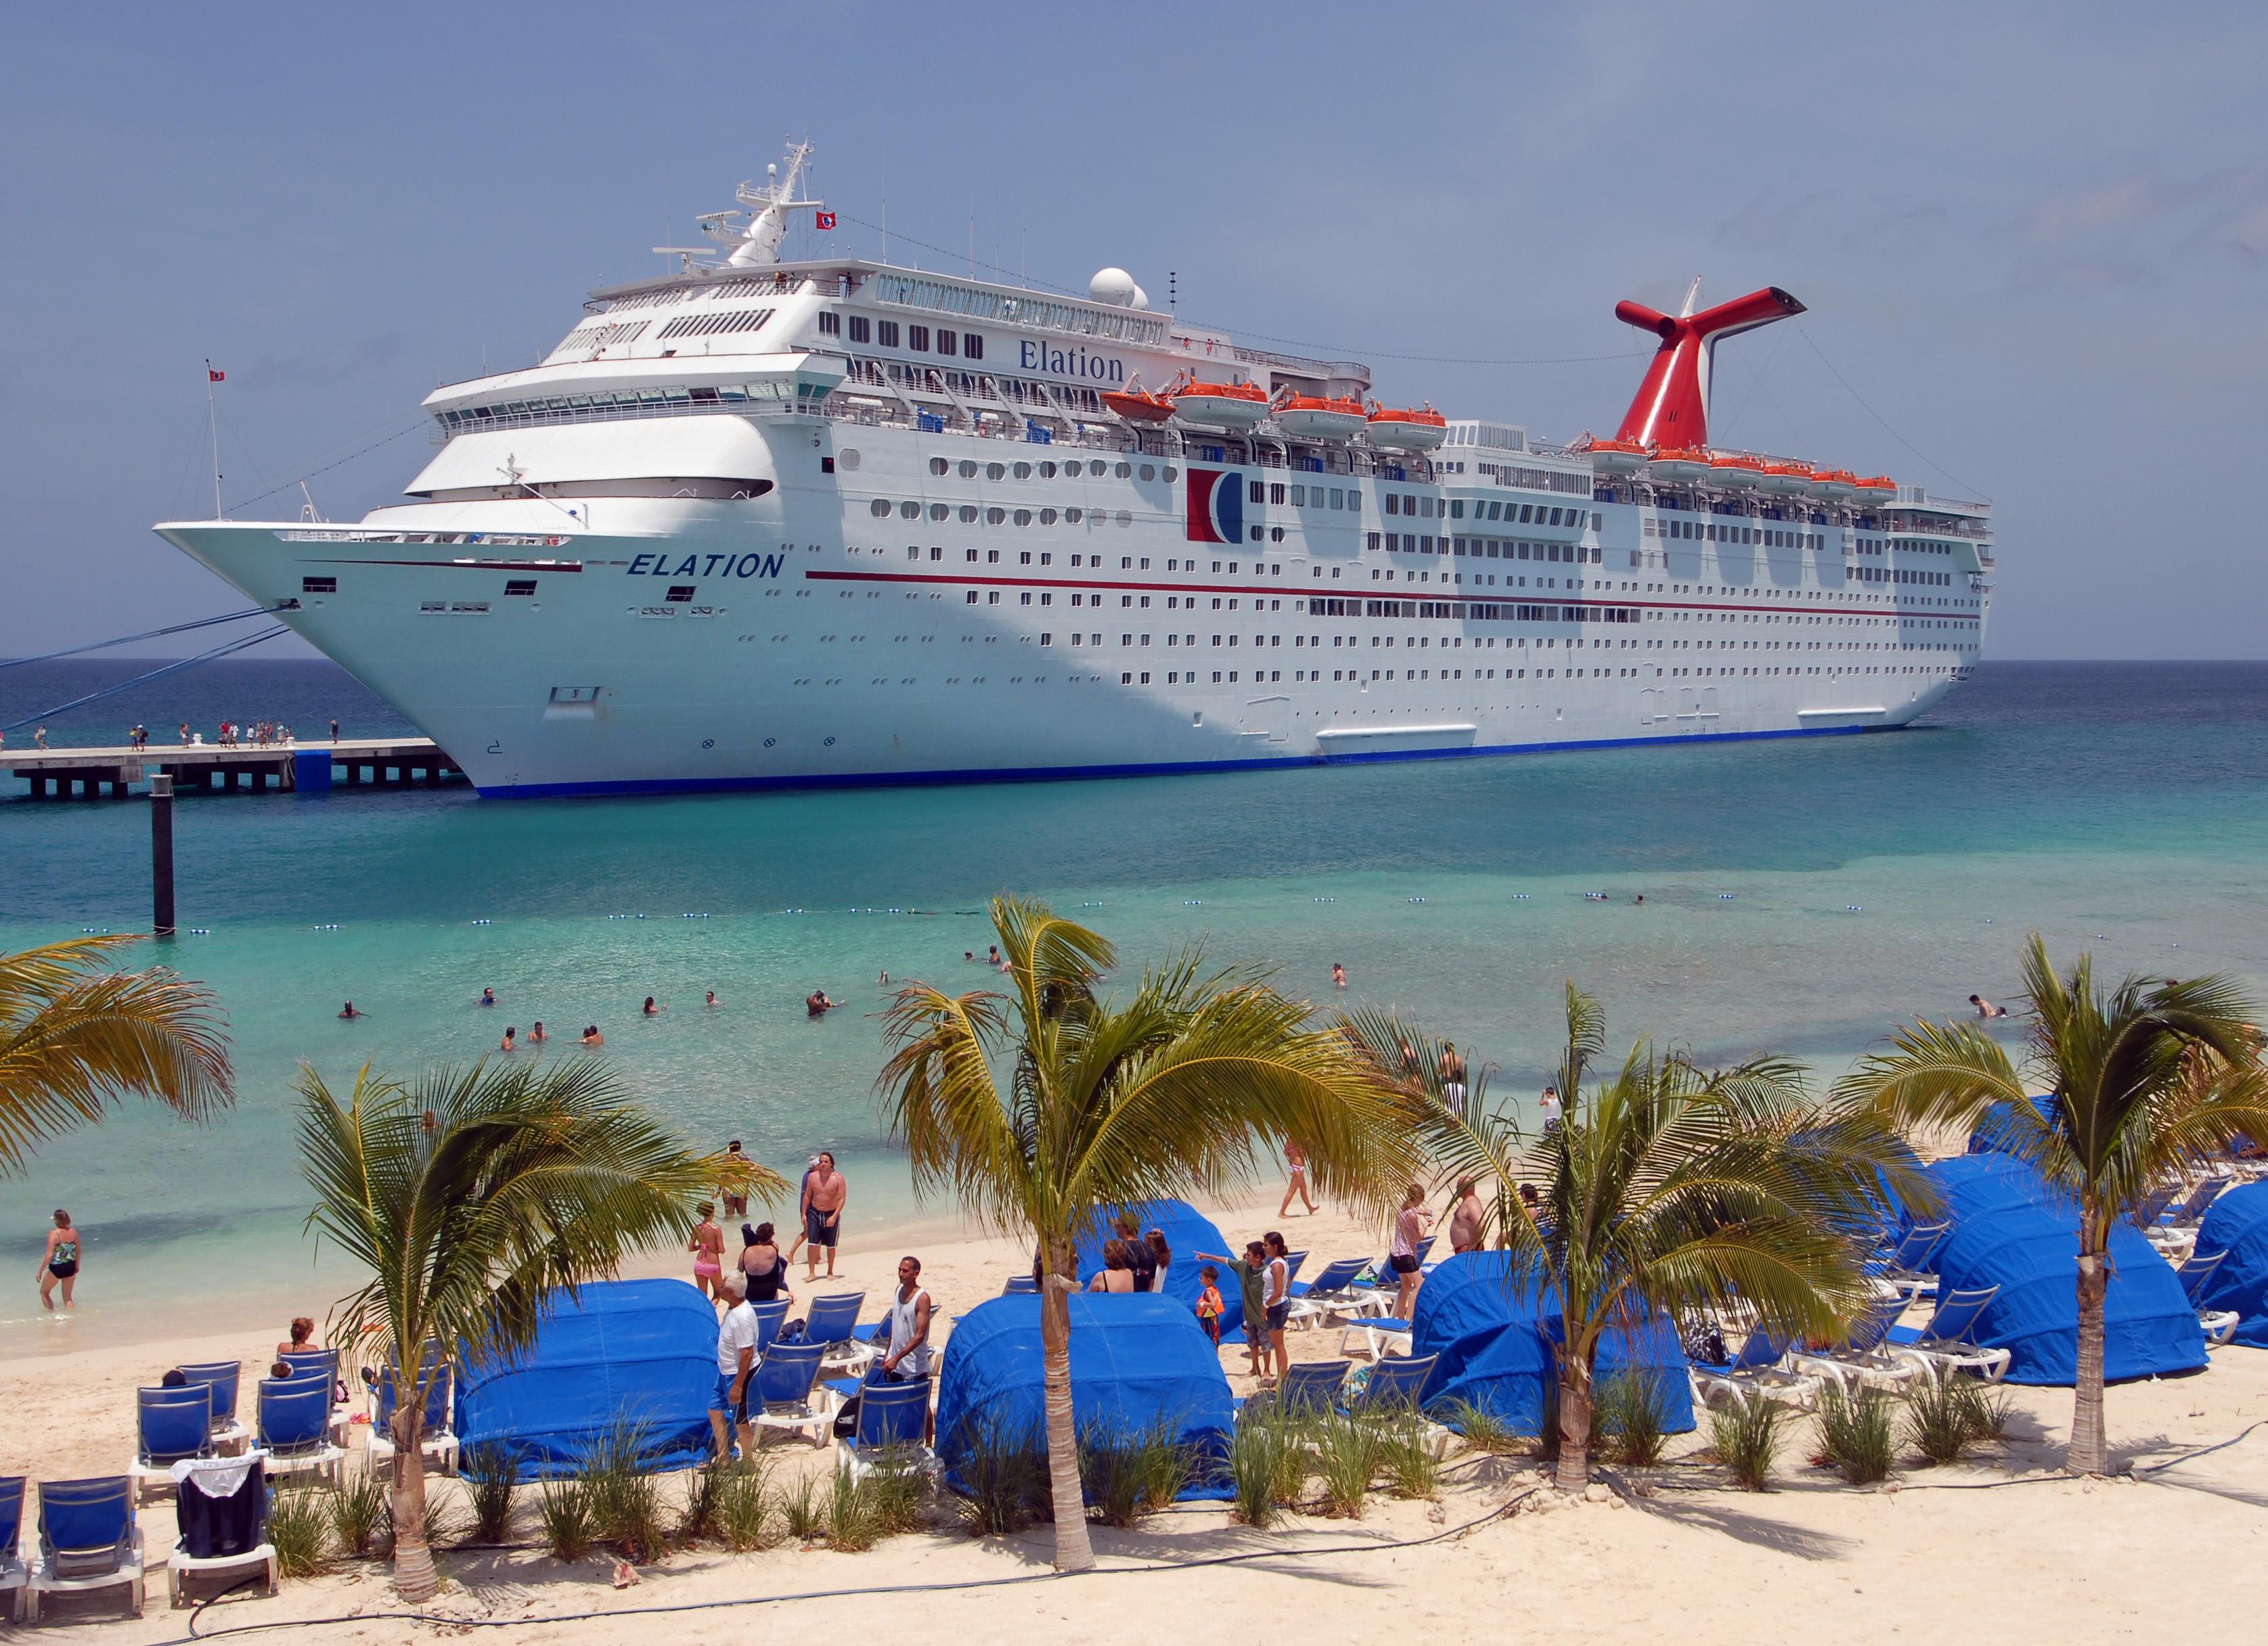 Carnival Cruise Splendor Deck Plan Rare Home Decorations Design list of things